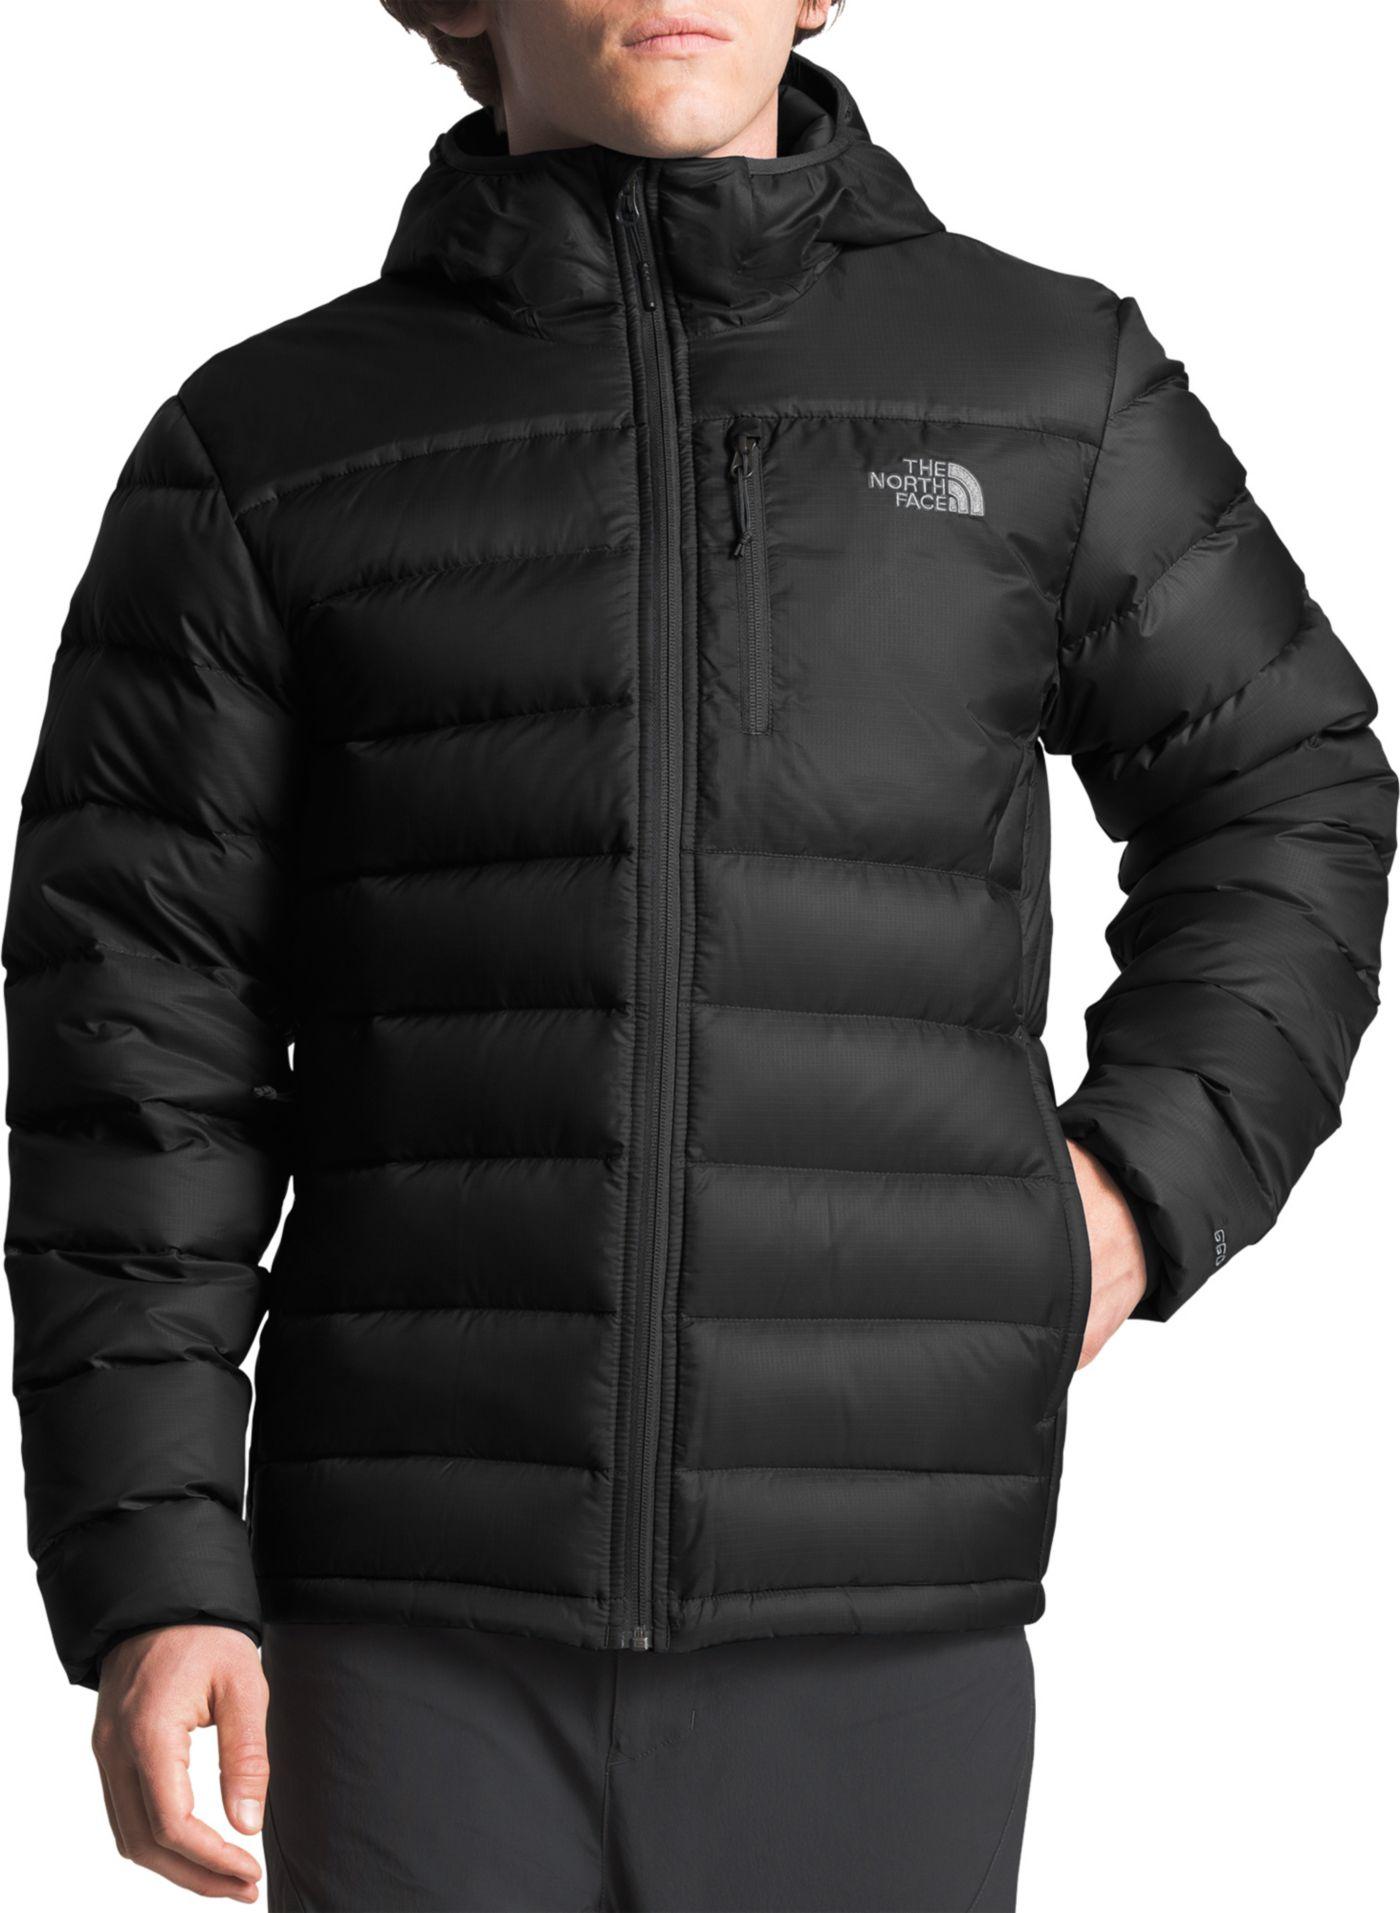 The North Face Men's Aconcagua Down Jacket